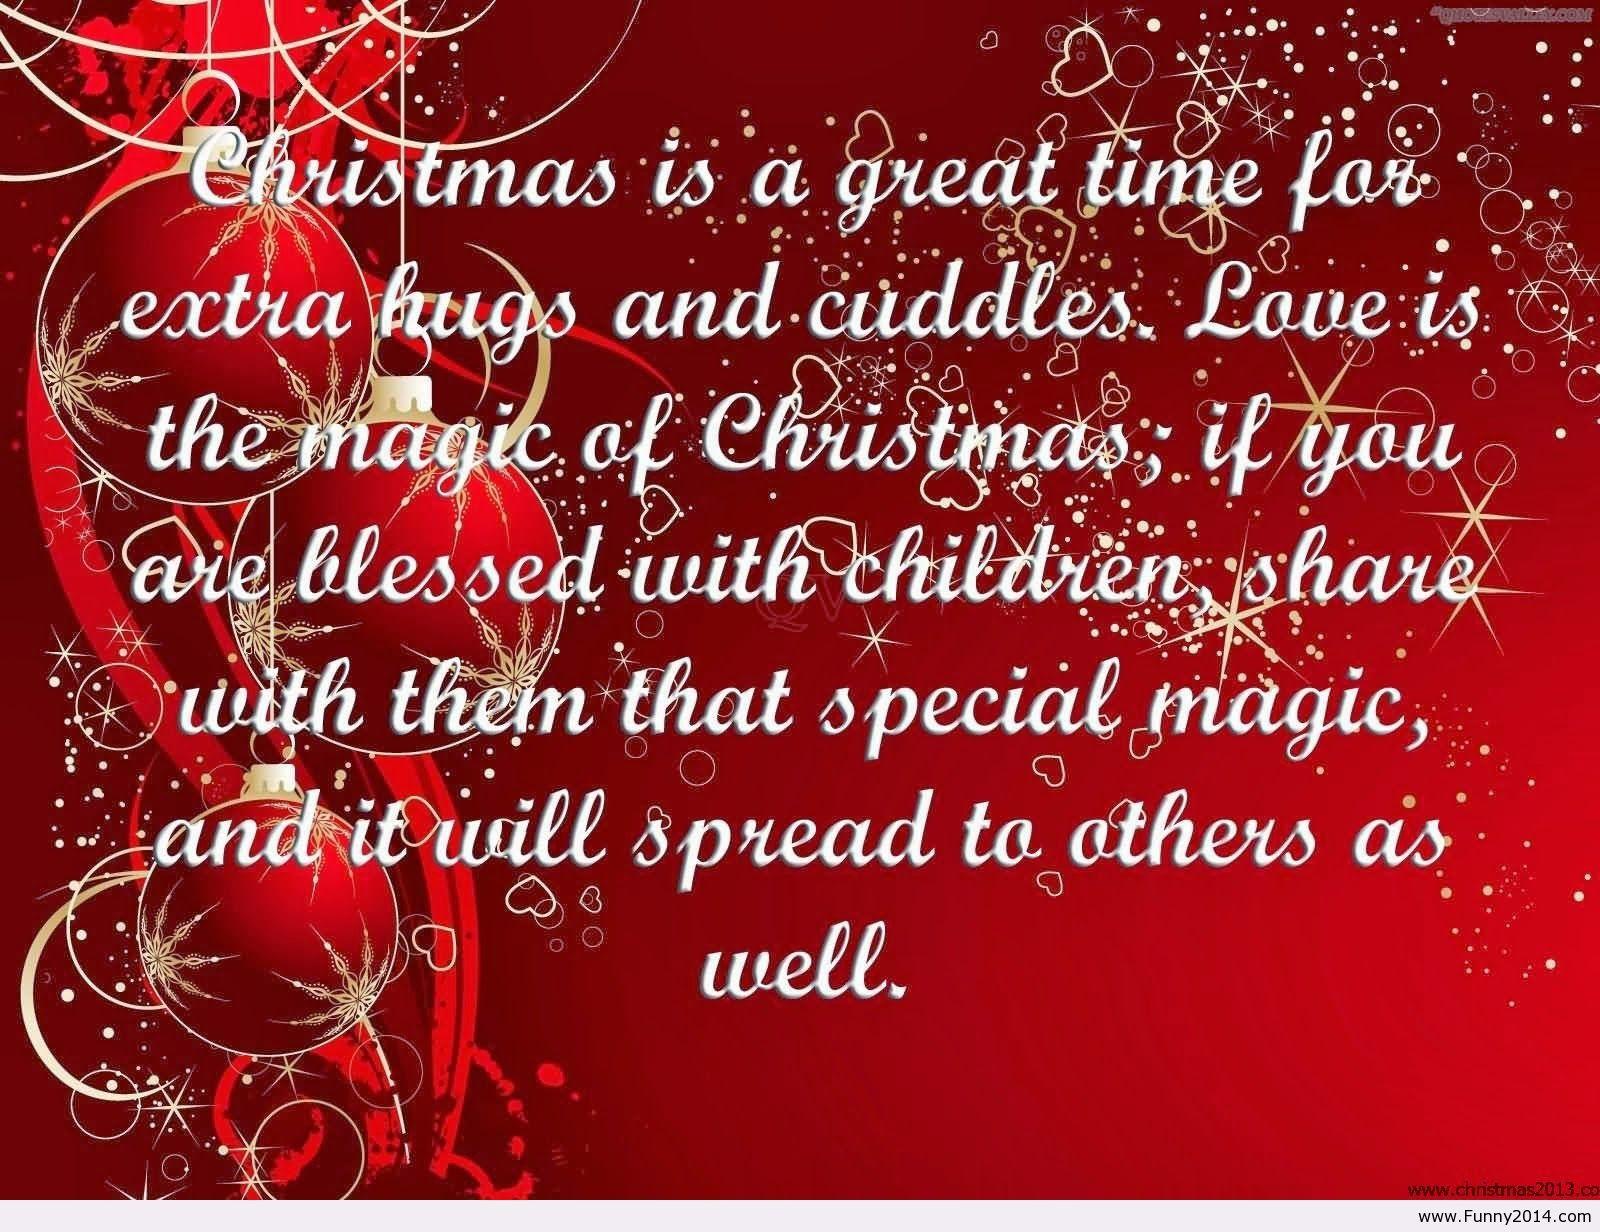 Merry christmas greetings sayings choice image greetings card christmas saying for friends christmas pinterest christmas m4hsunfo